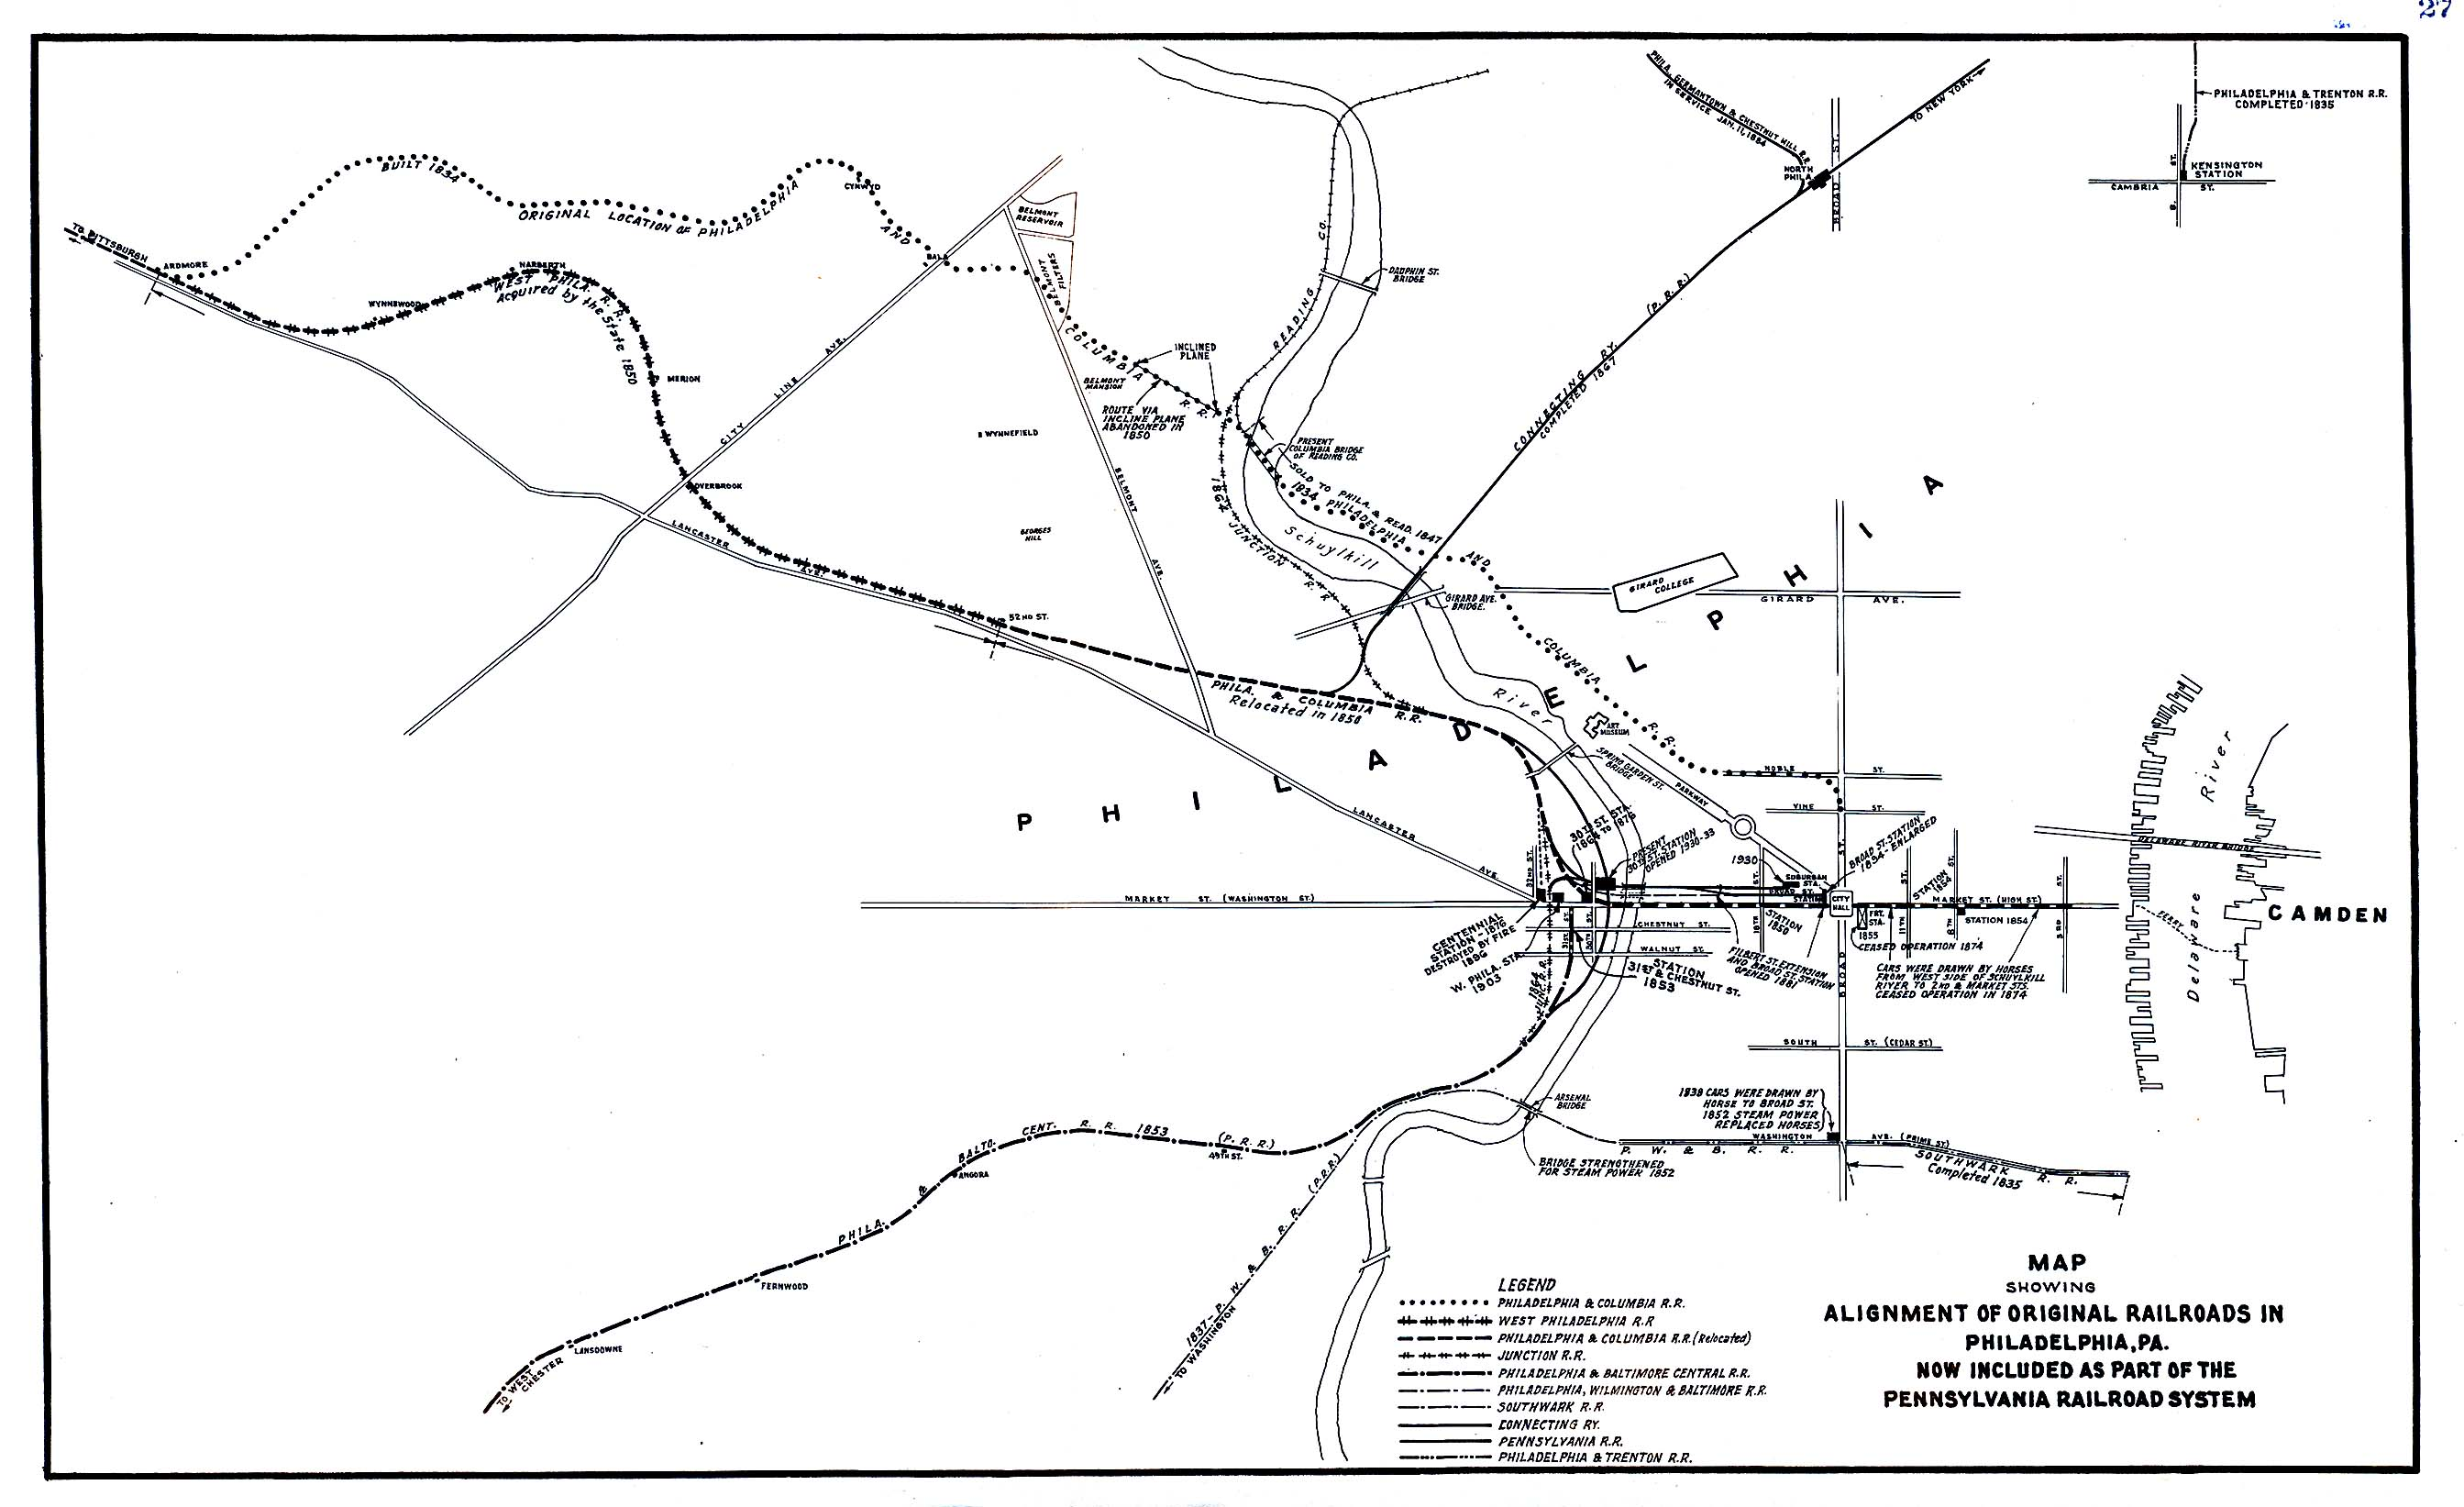 Philadelphia Original Railroads